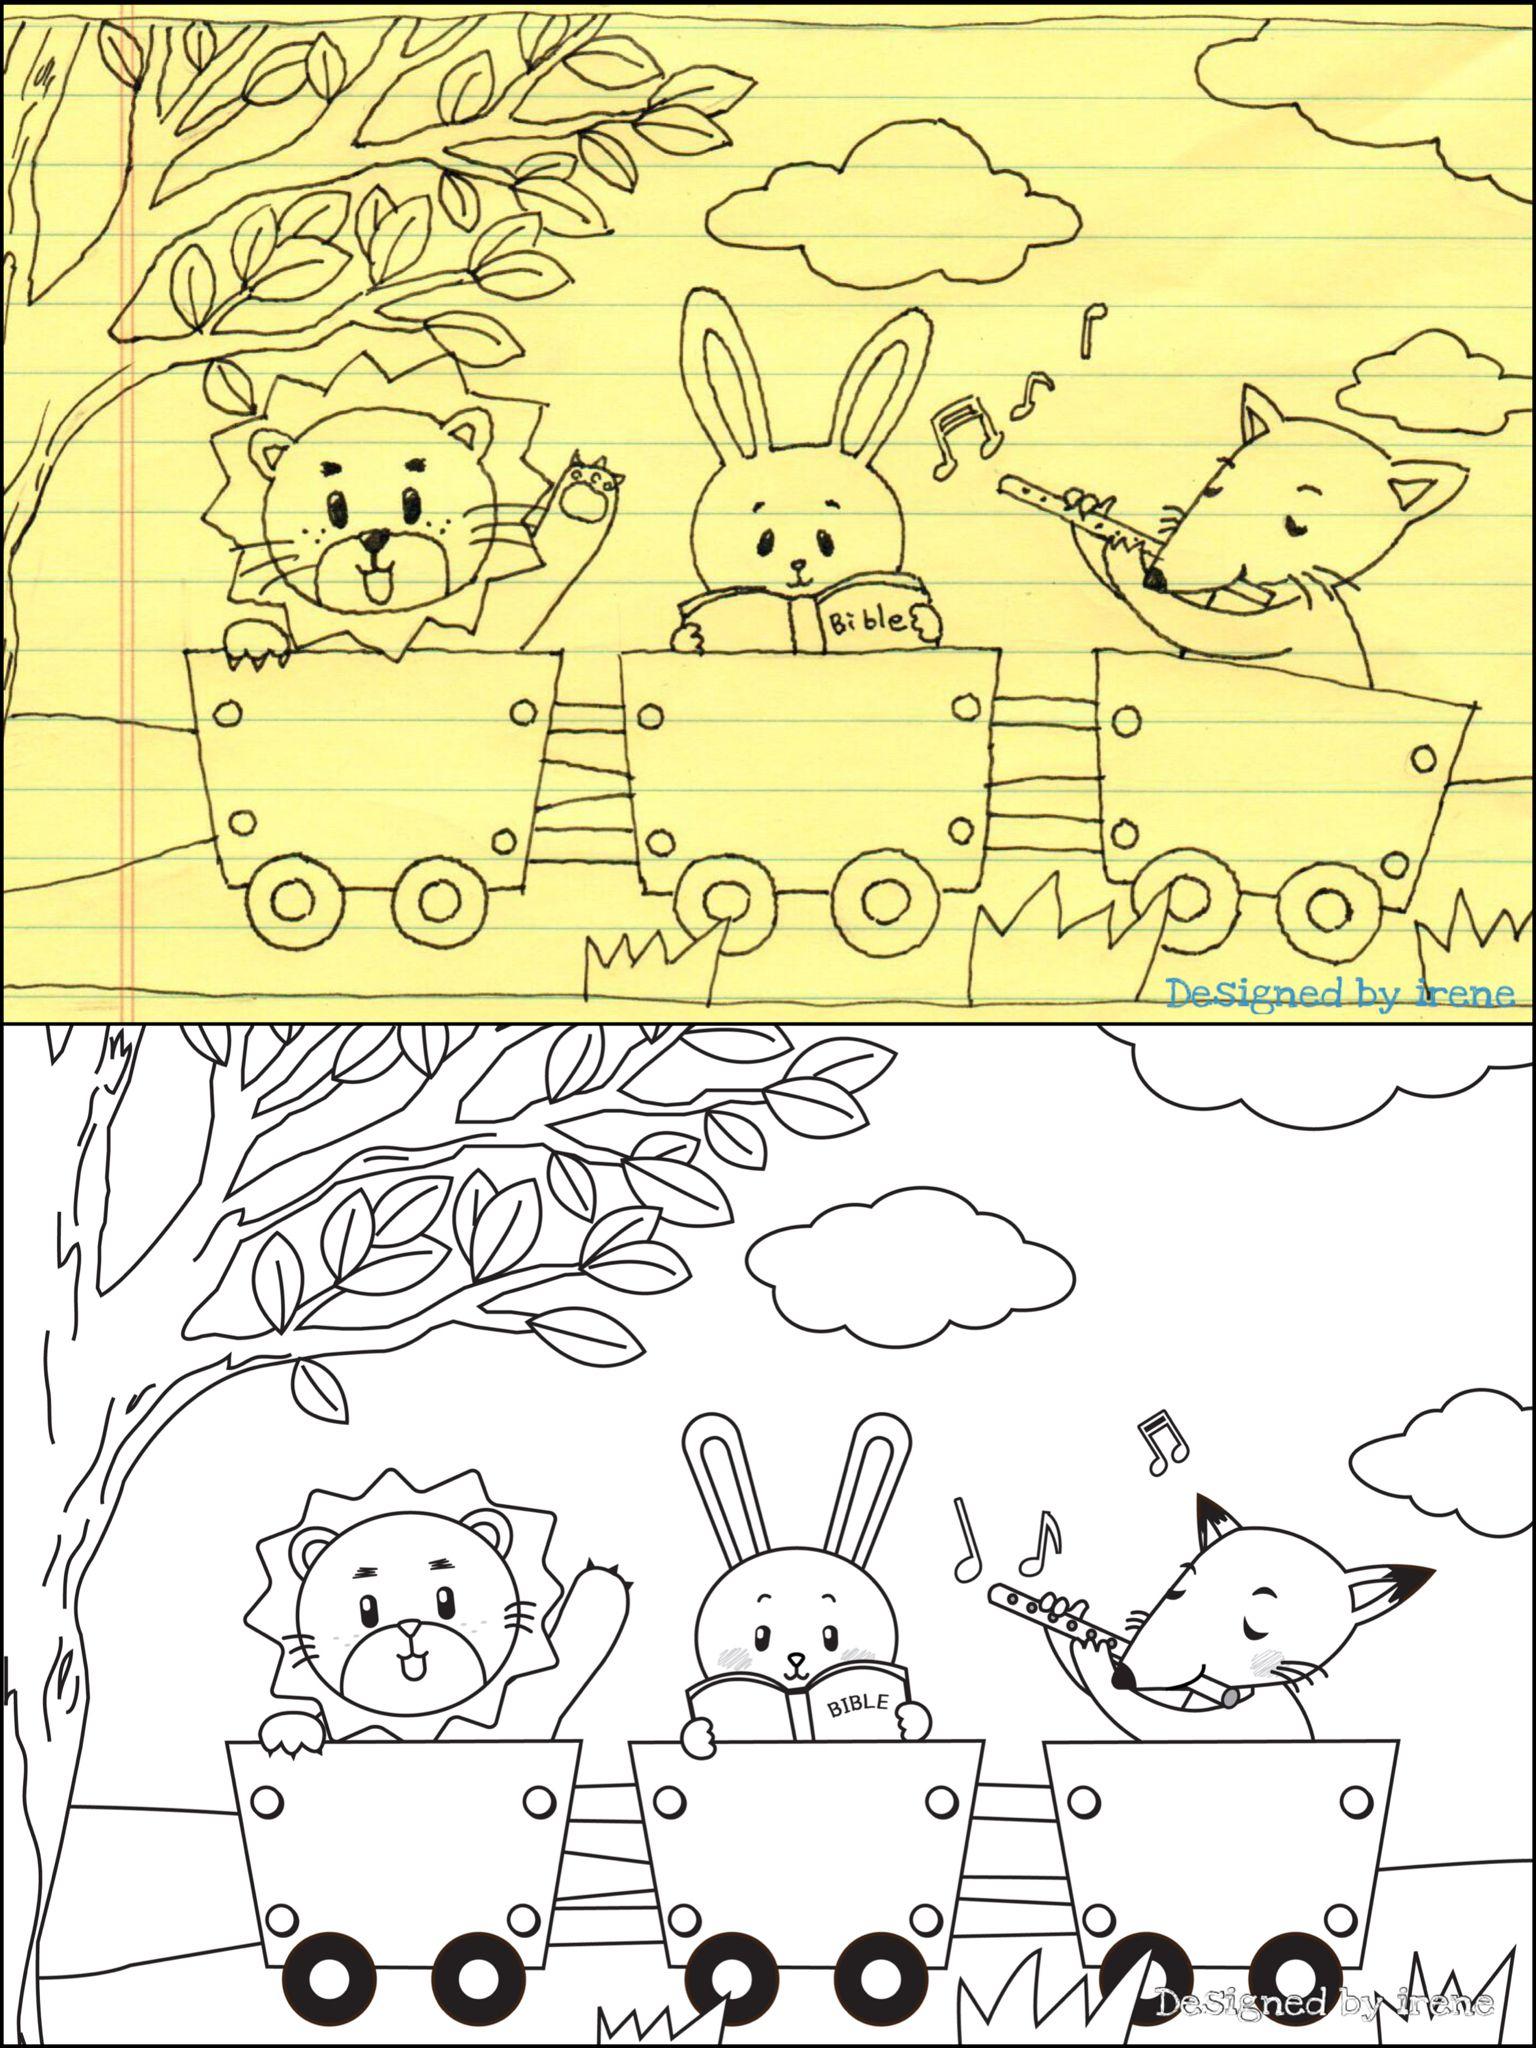 Coloring❤️ 어린이 색칠공부 일러스트 그리기~~ 원본 스케치와, 일러스트레이터 작업 완성 이미지.